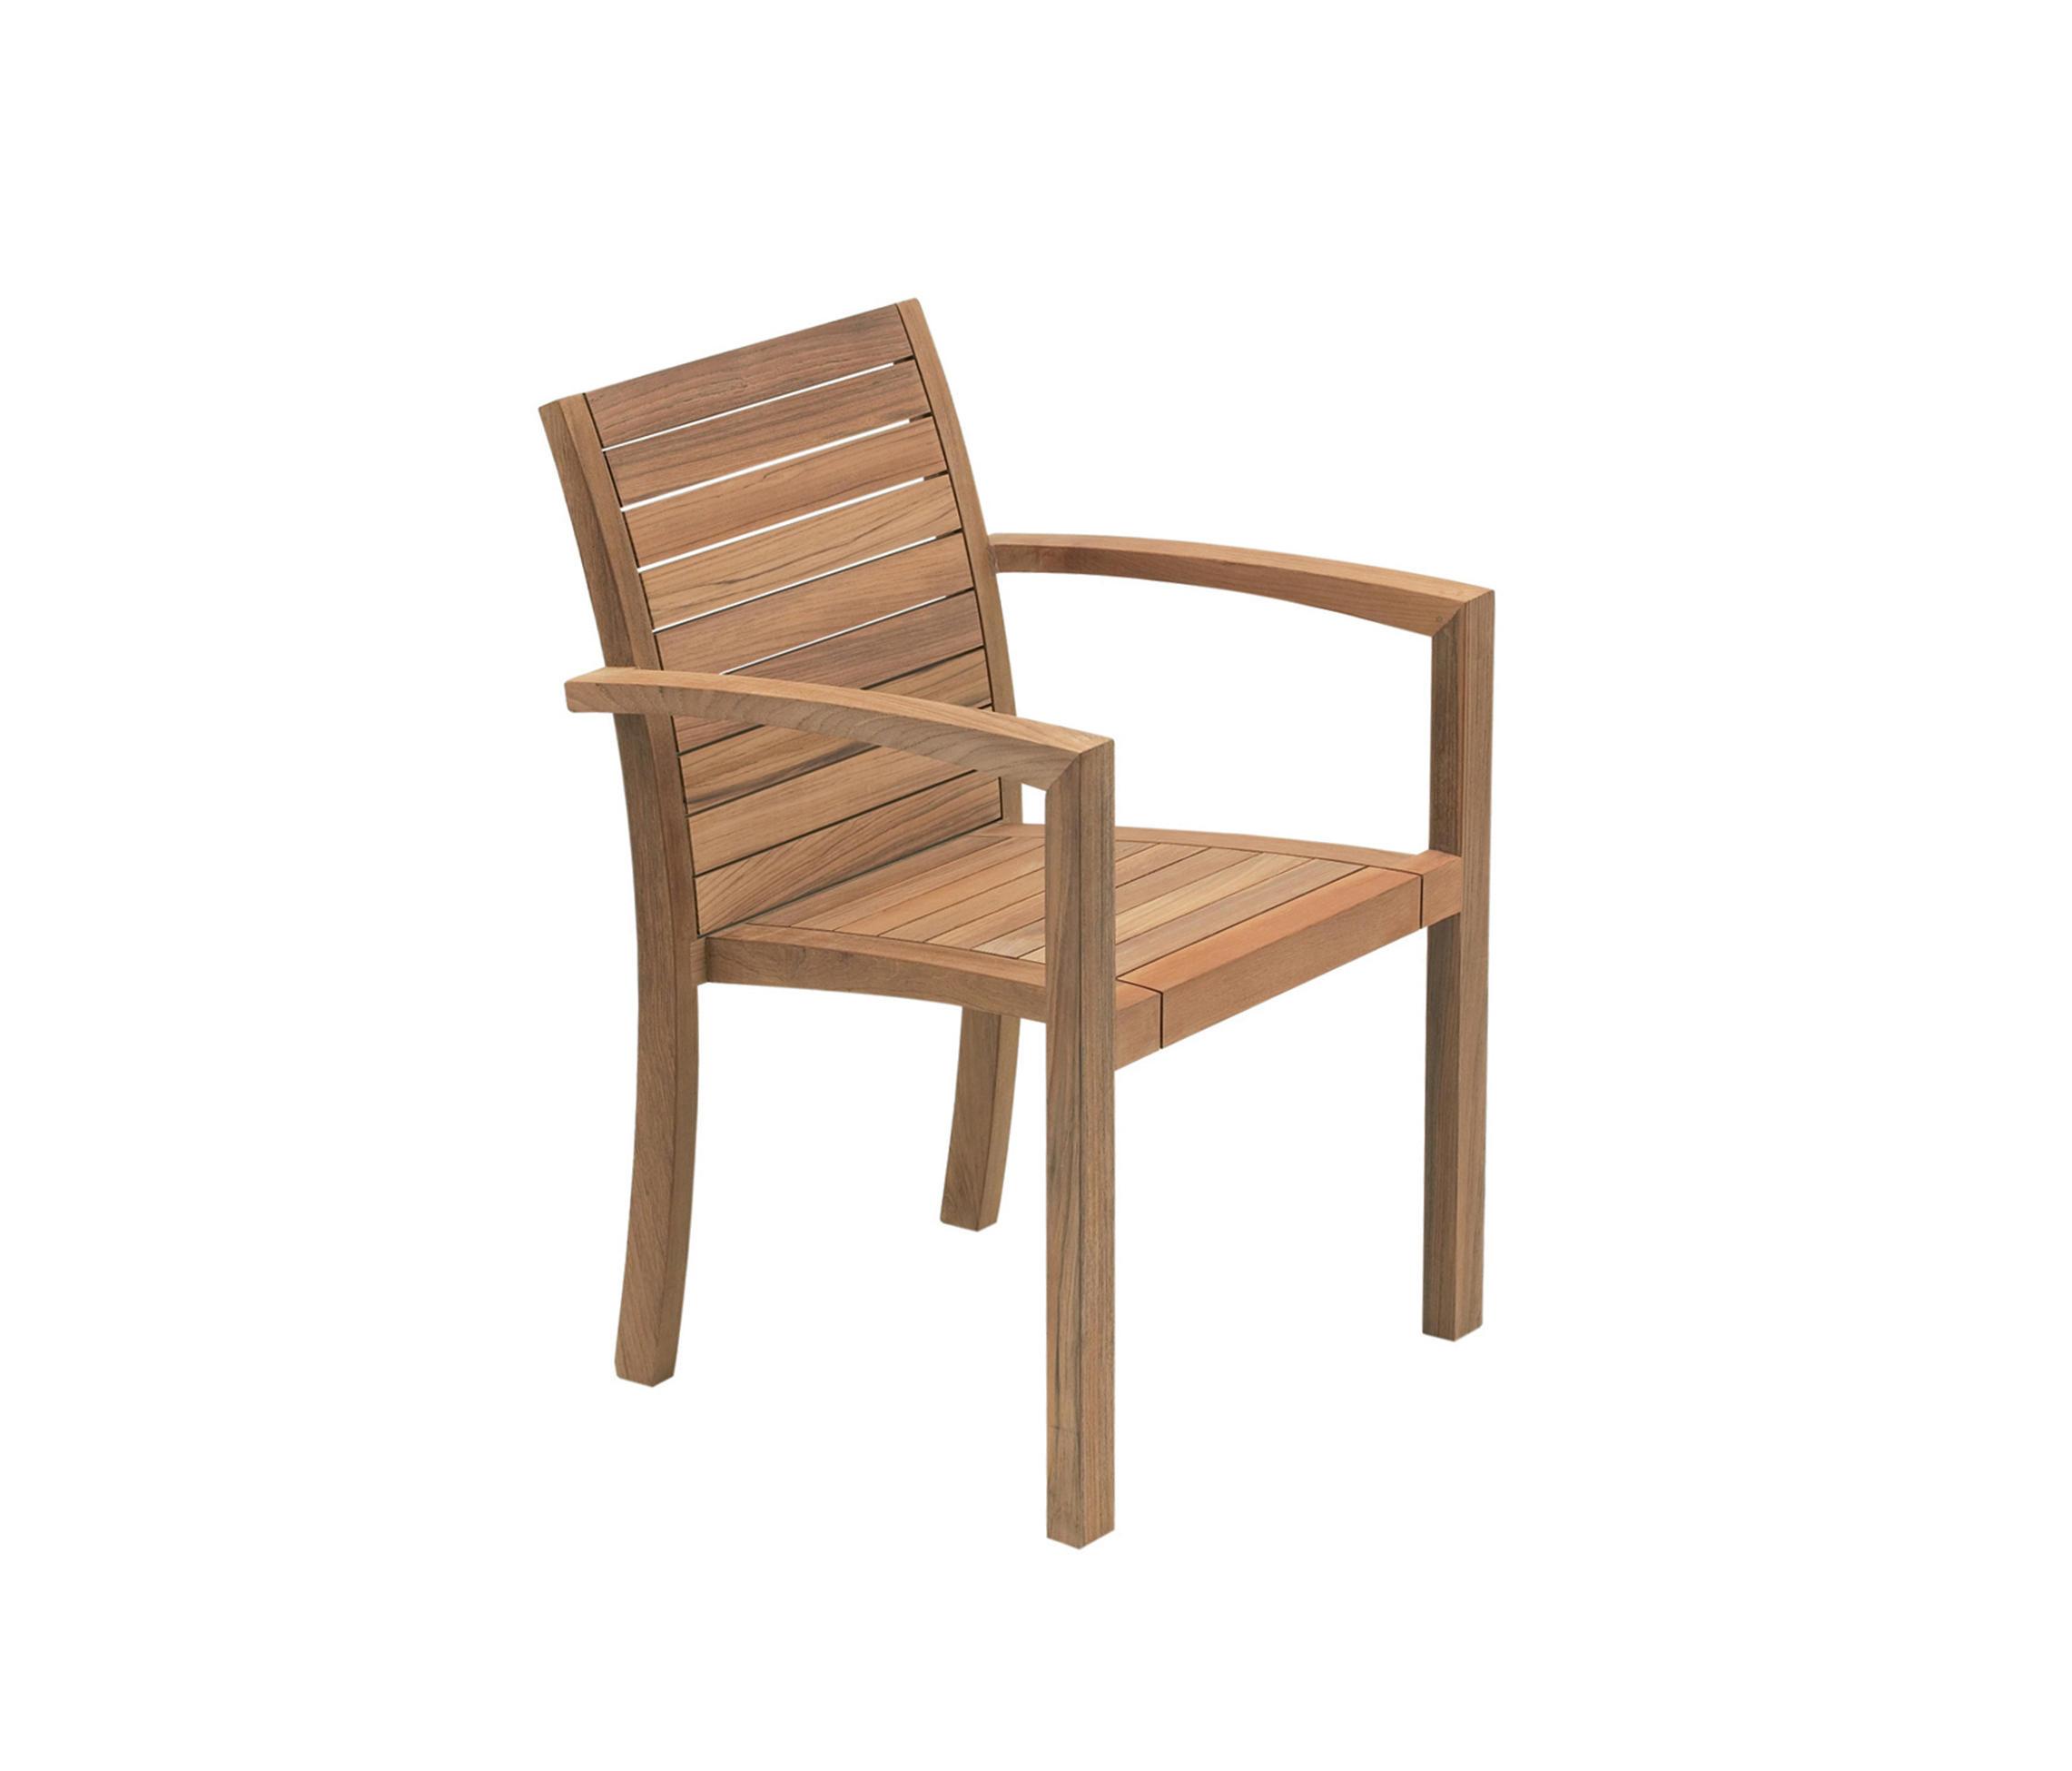 IXIT 55 STUHL - Stühle von Royal Botania | Architonic